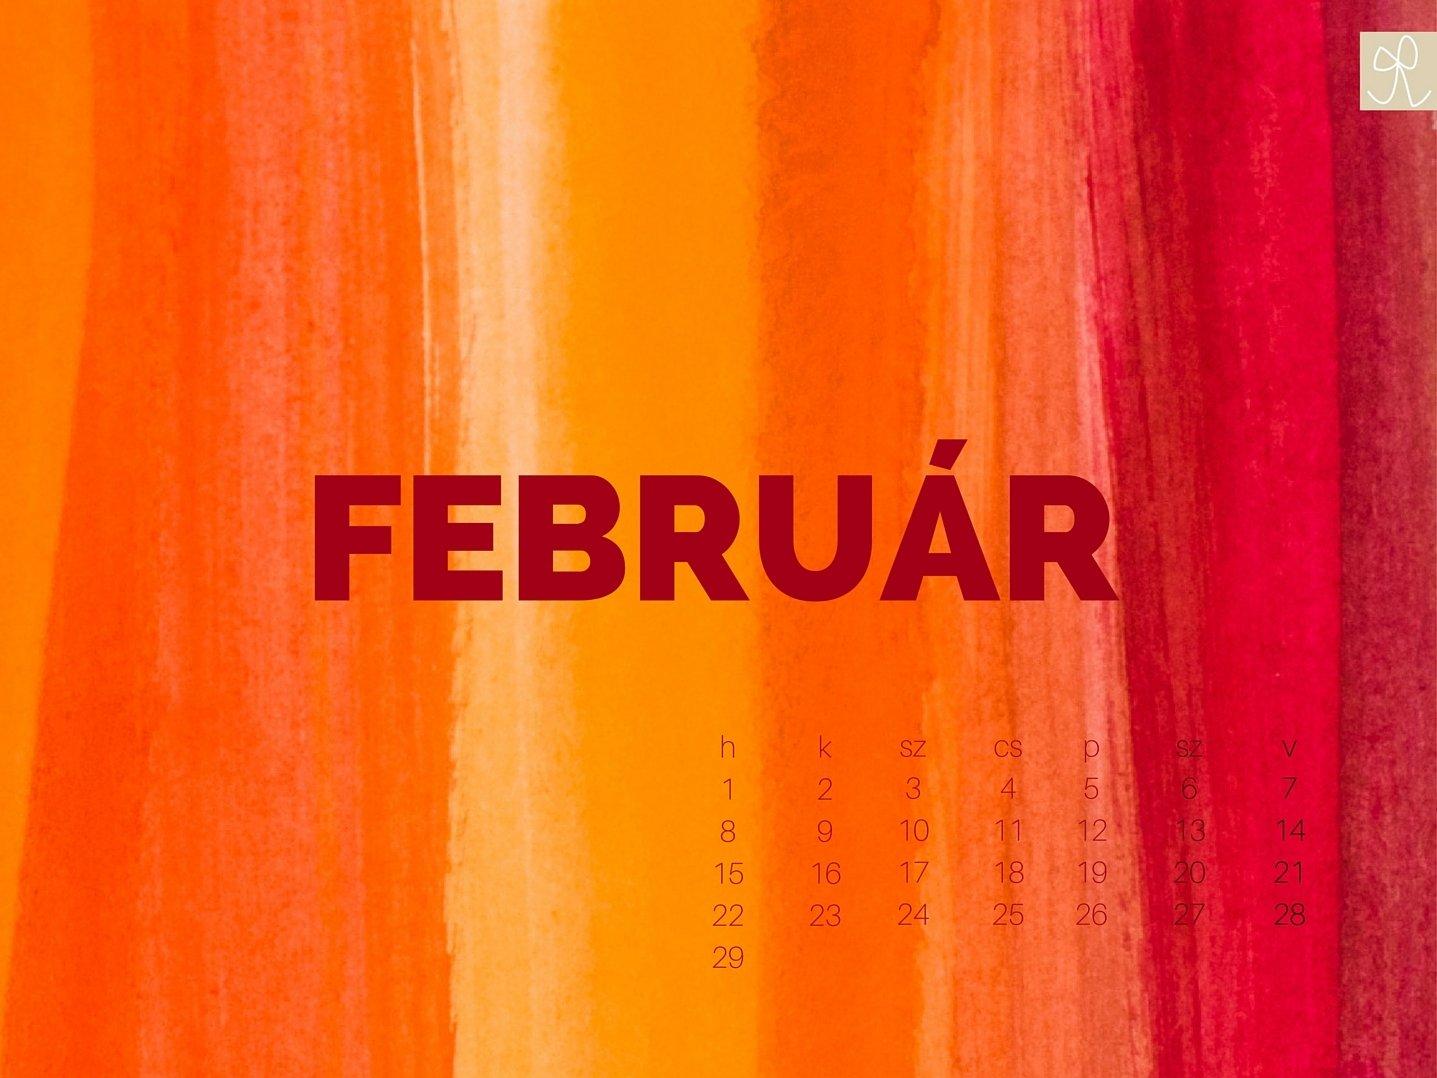 masni_februar_1600_1200